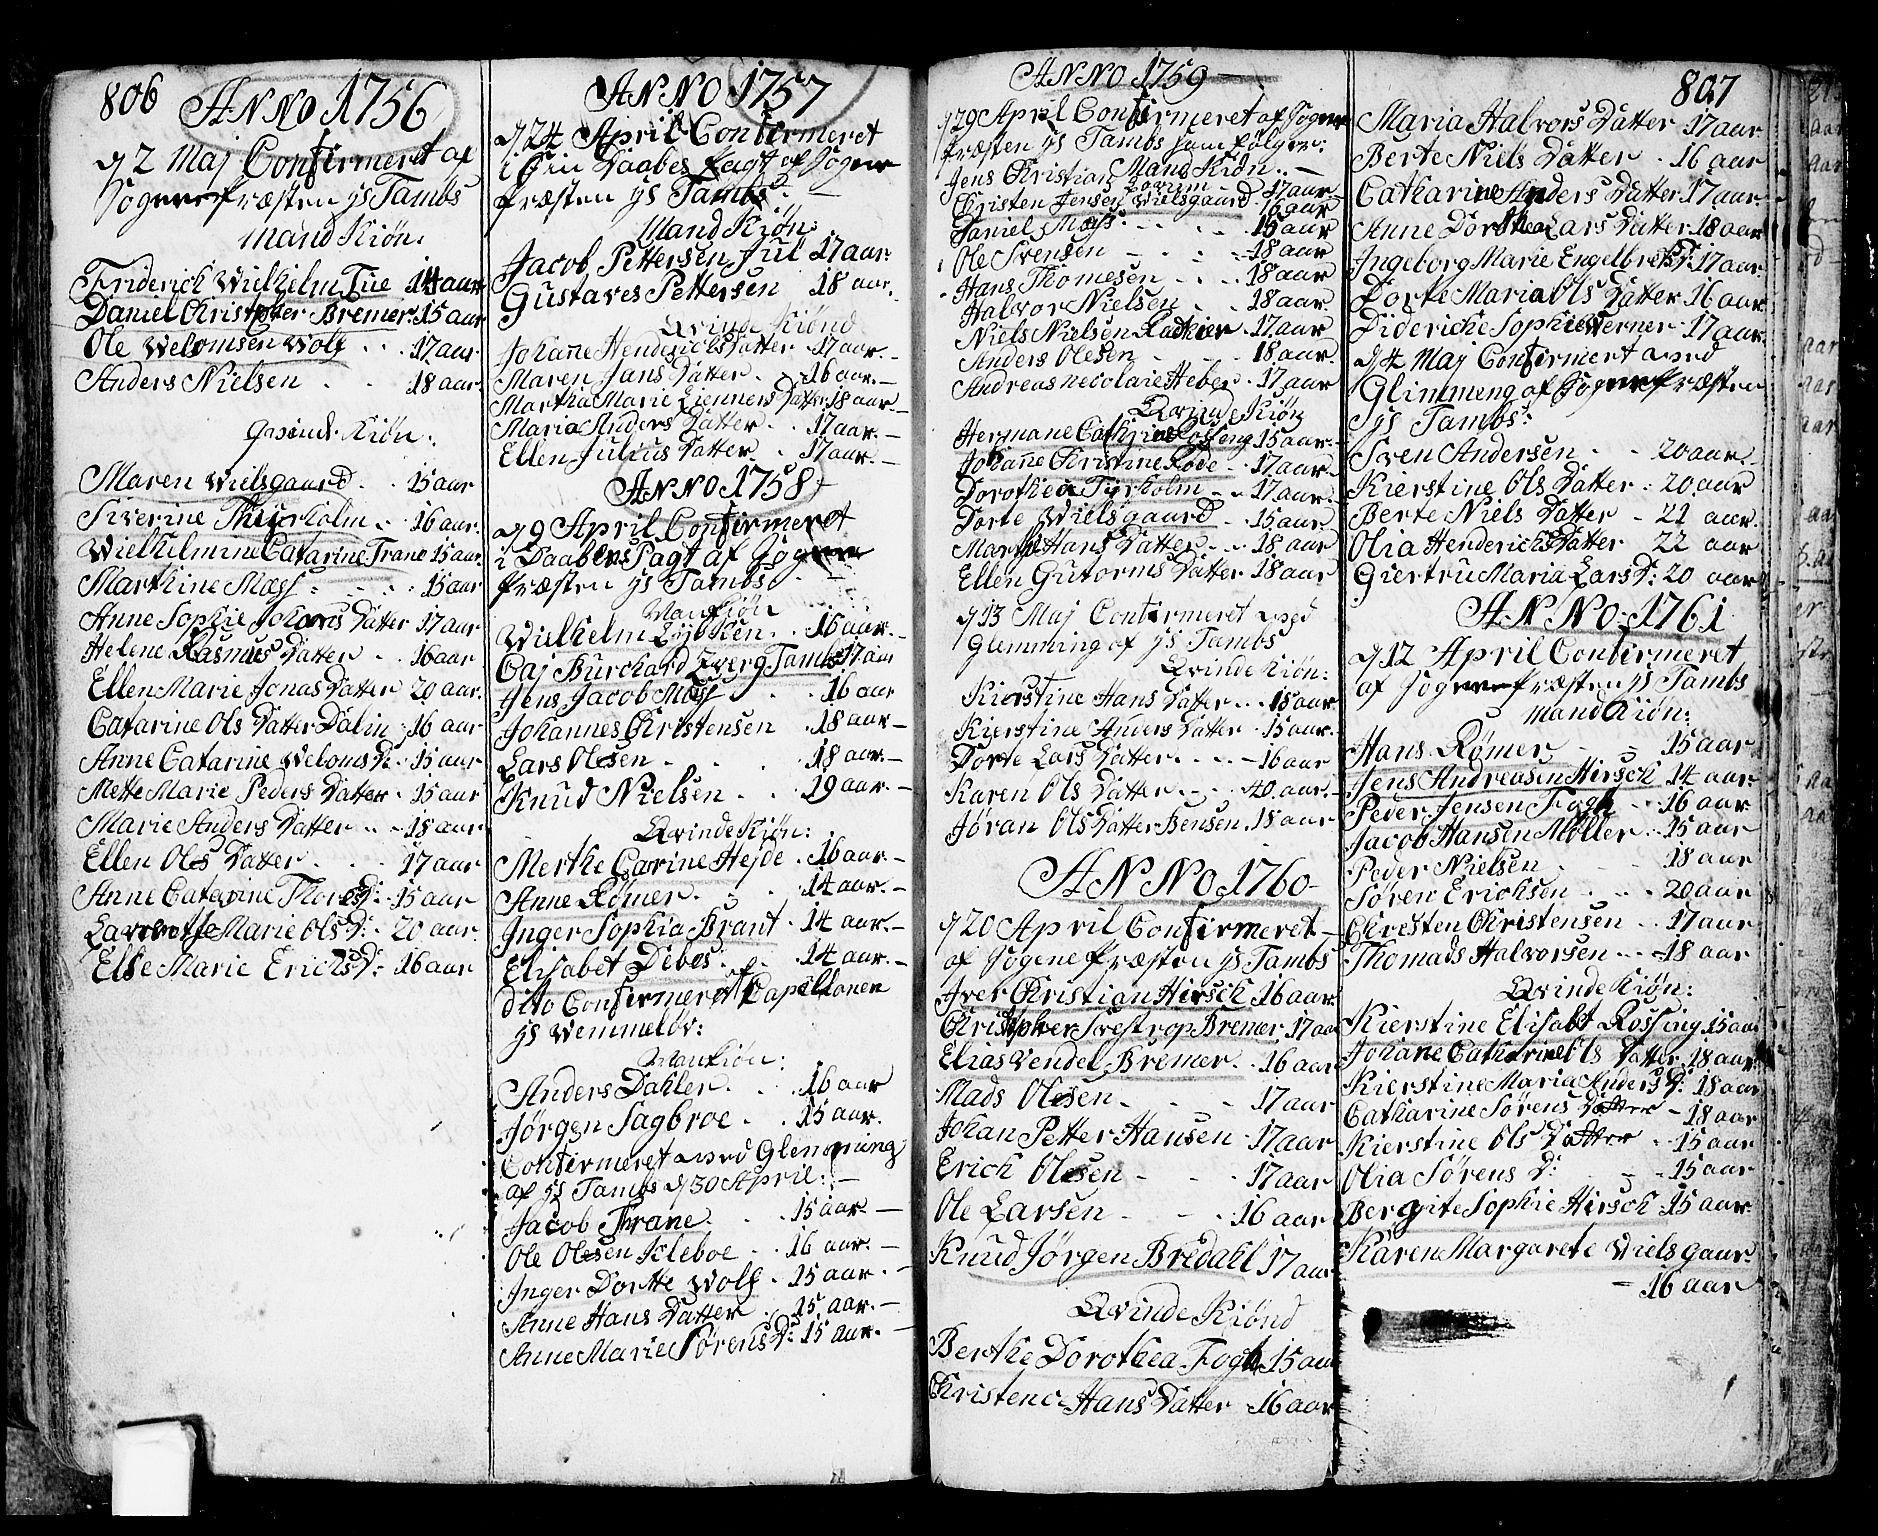 SAO, Fredrikstad prestekontor Kirkebøker, F/Fa/L0002: Ministerialbok nr. 2, 1750-1804, s. 806-807